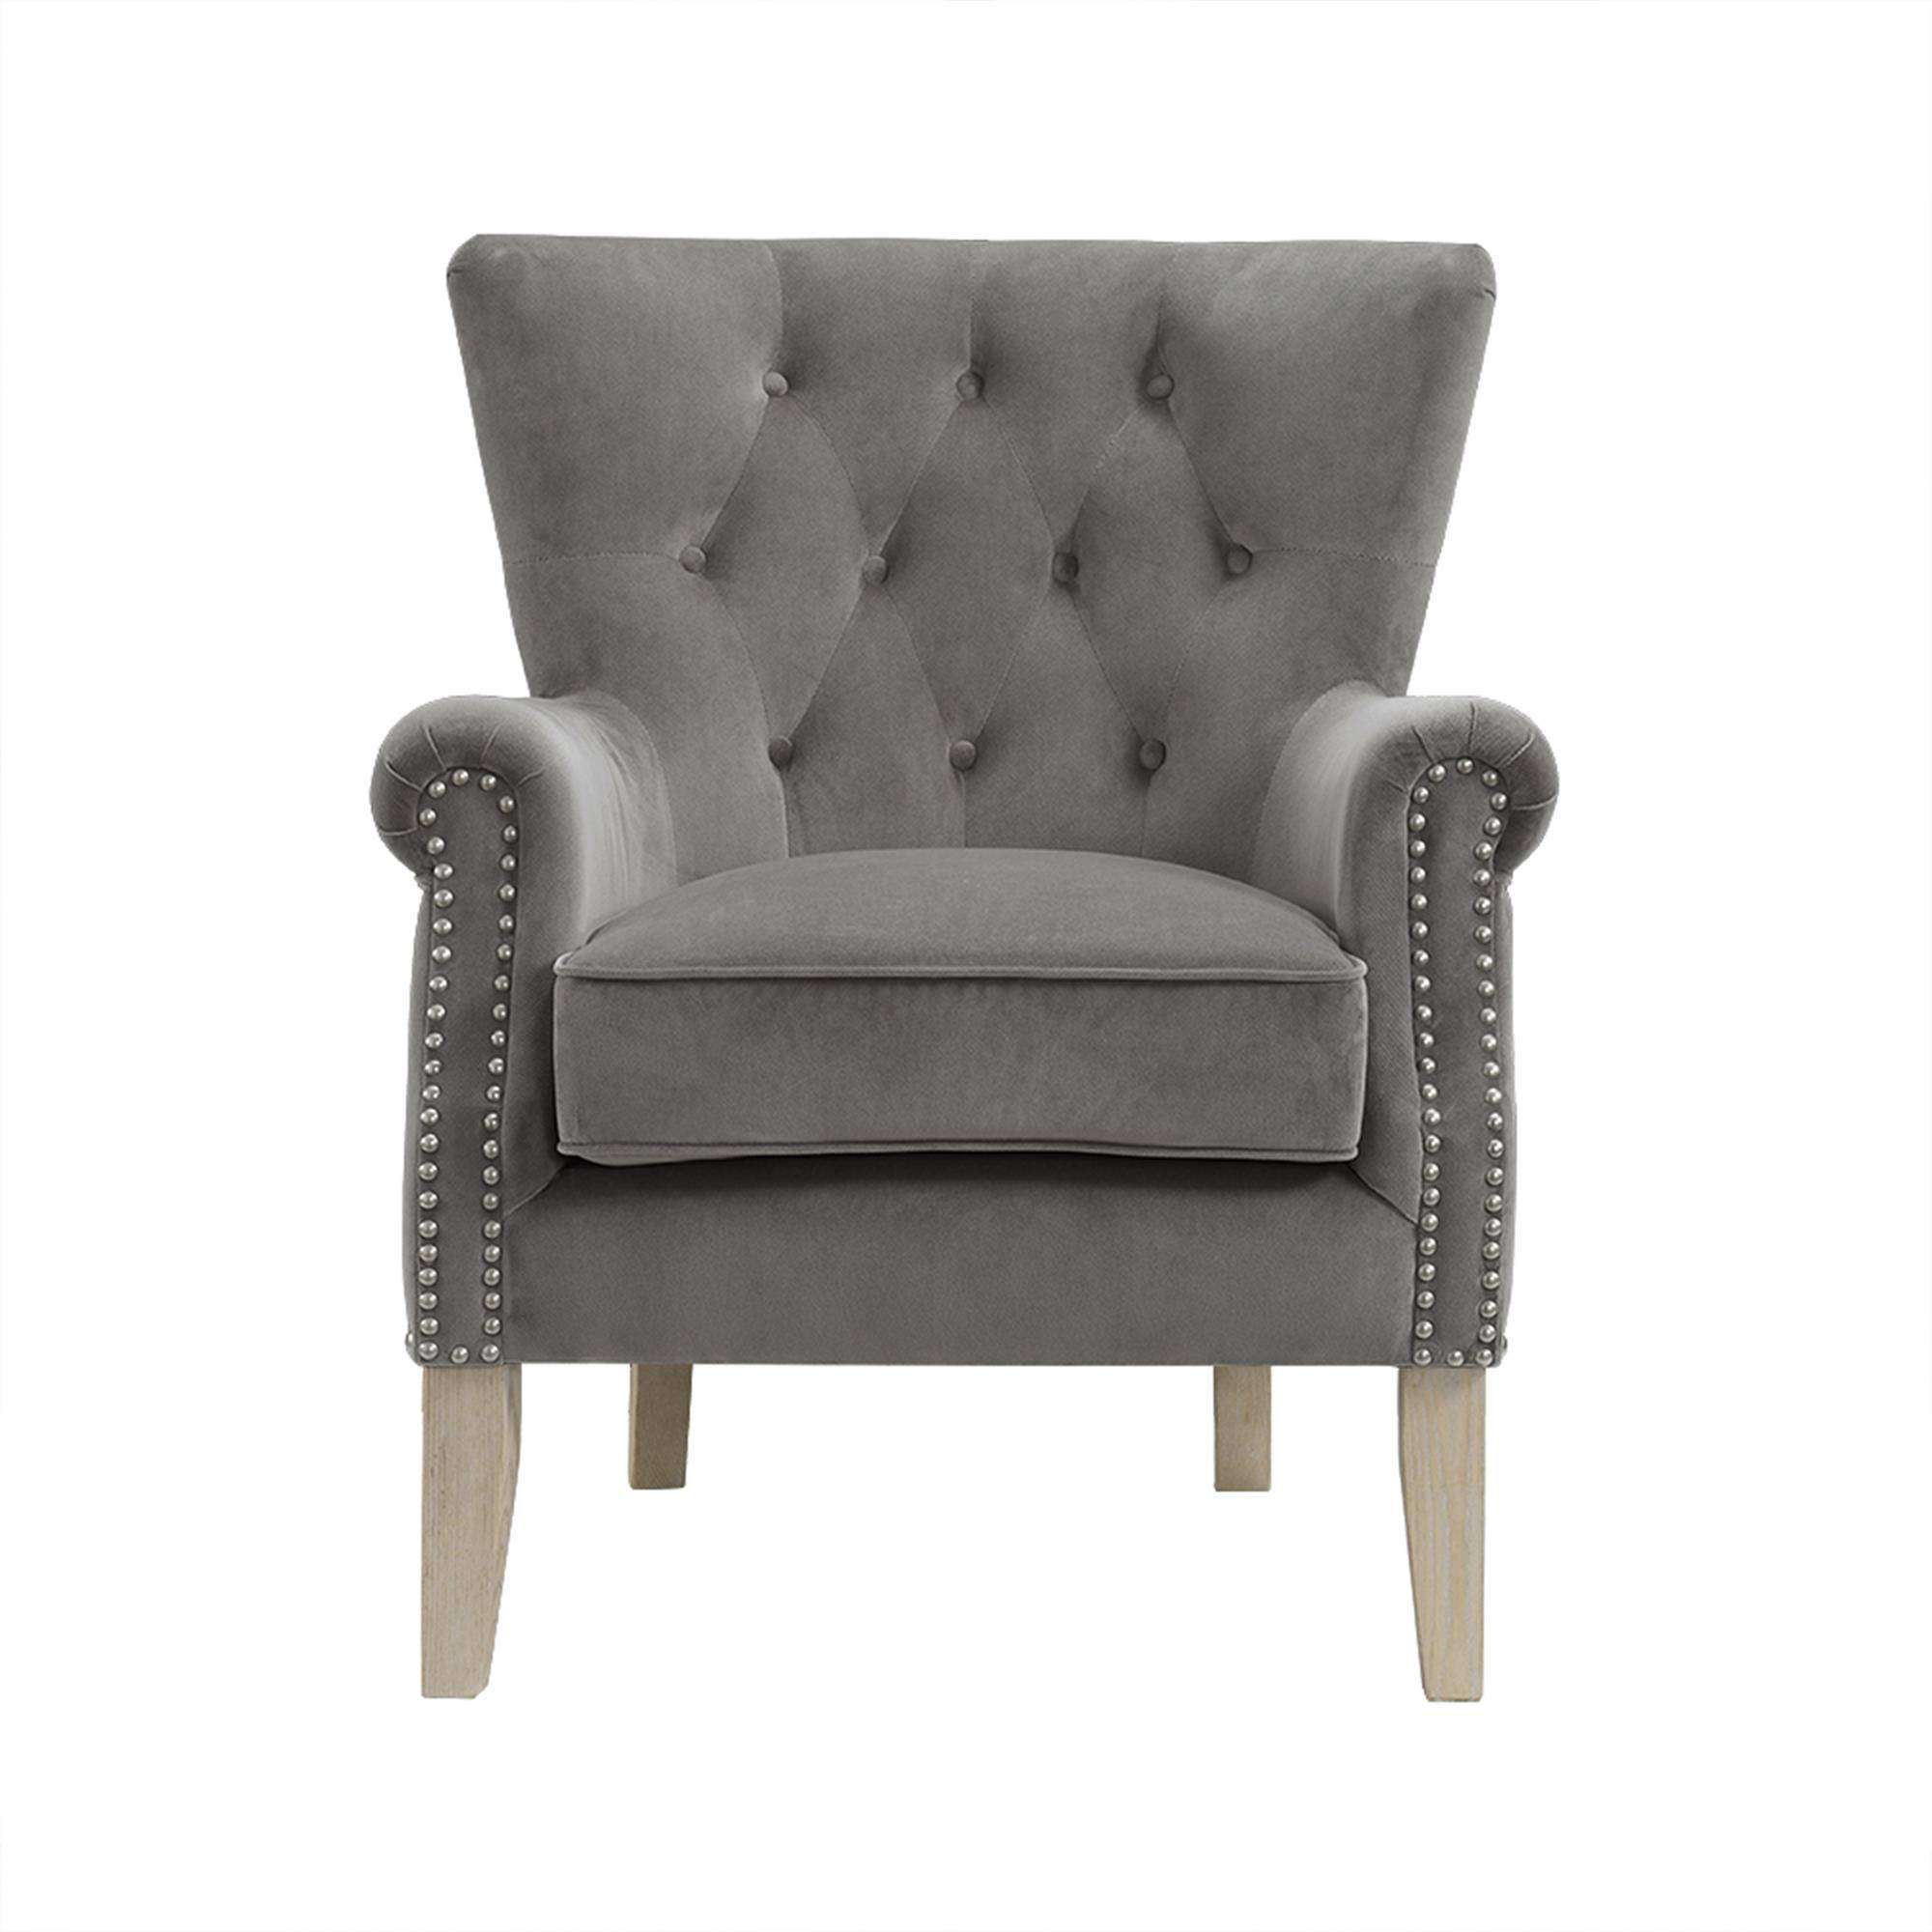 Better Homes & Gardens Accent Chair